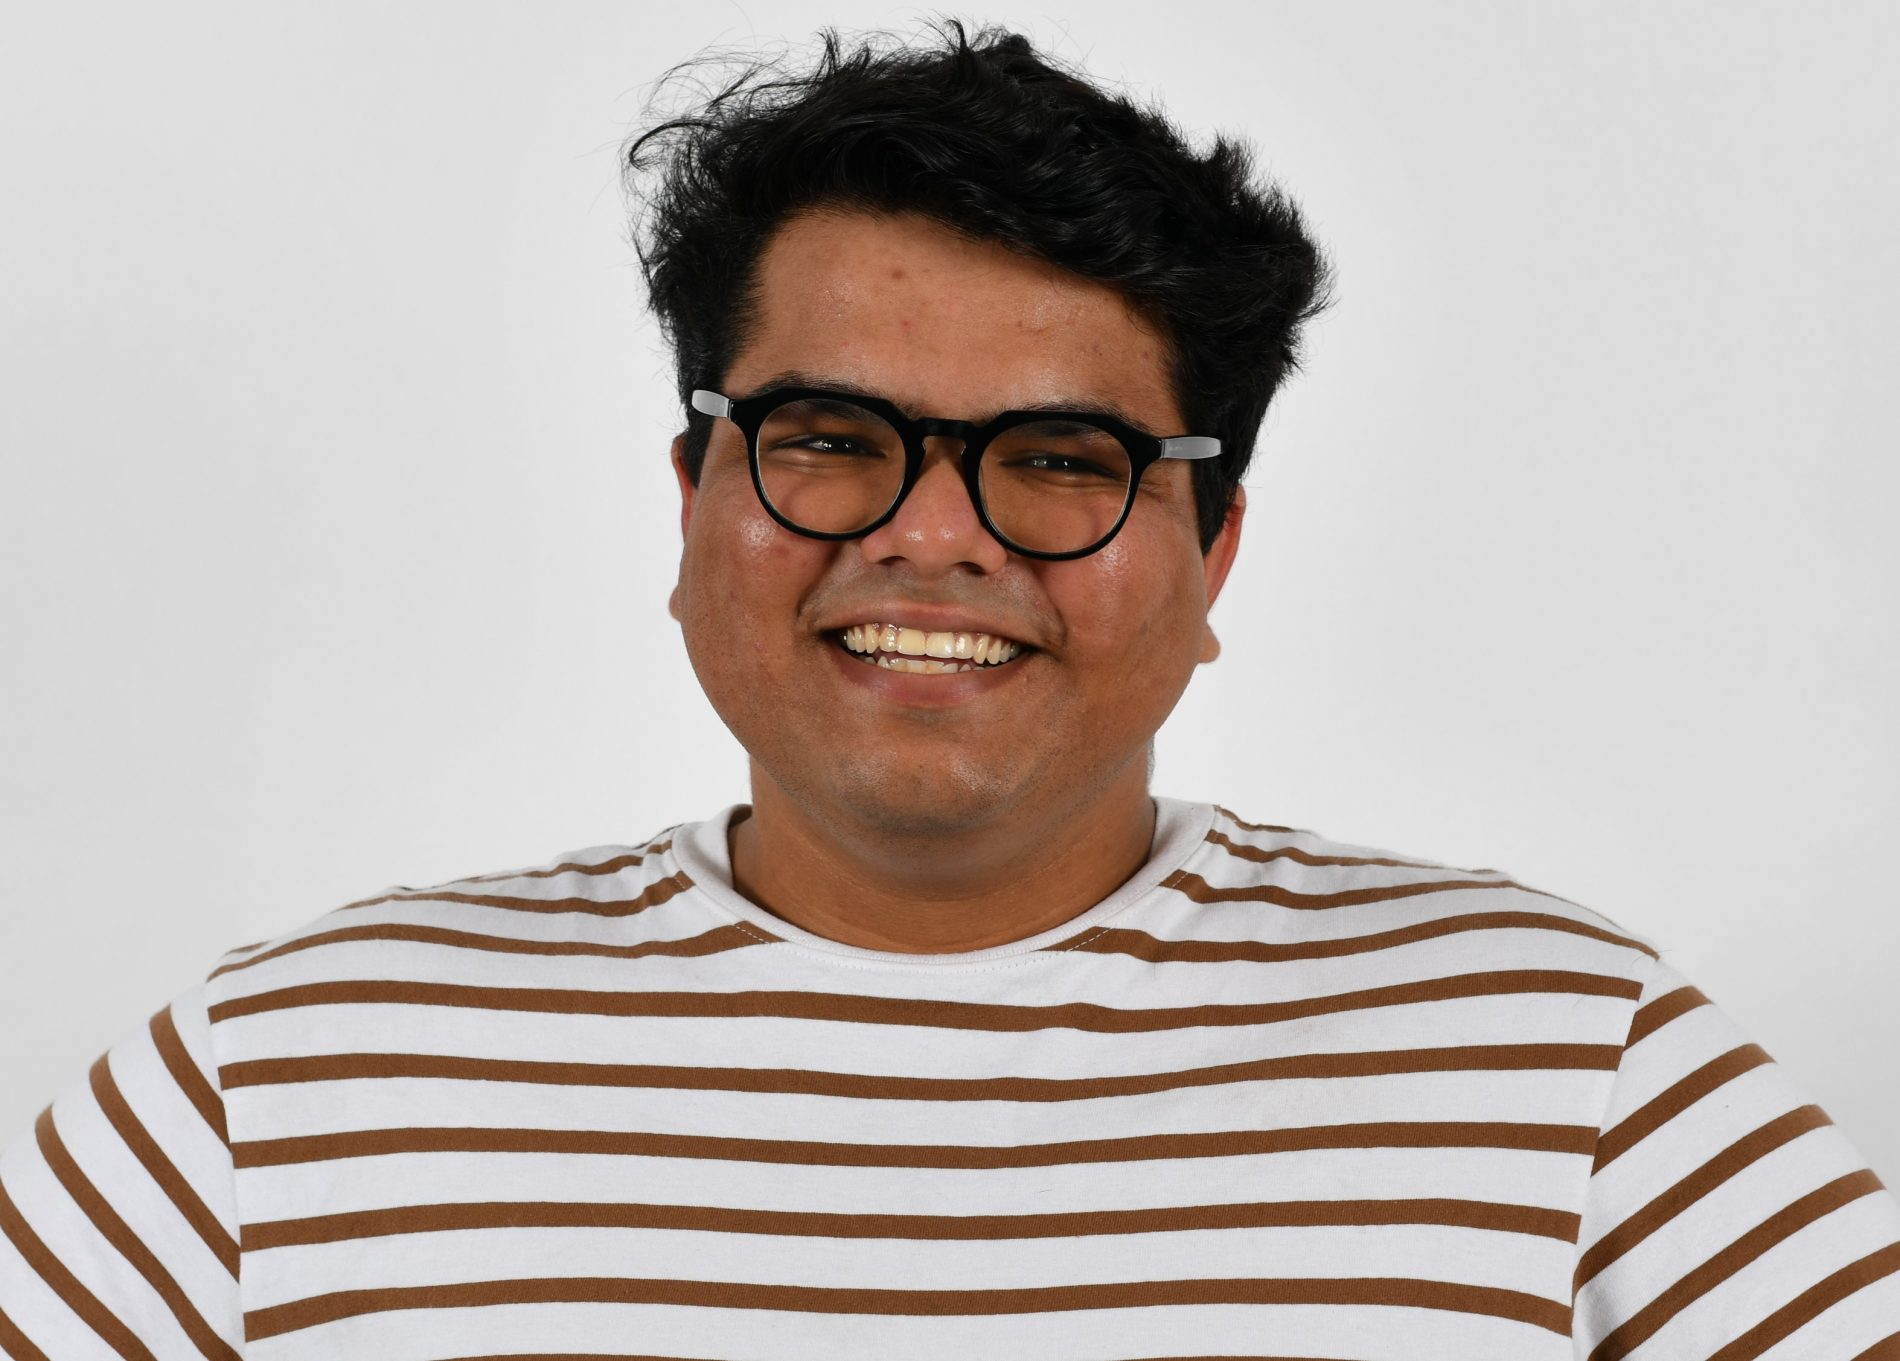 Tushar Advani